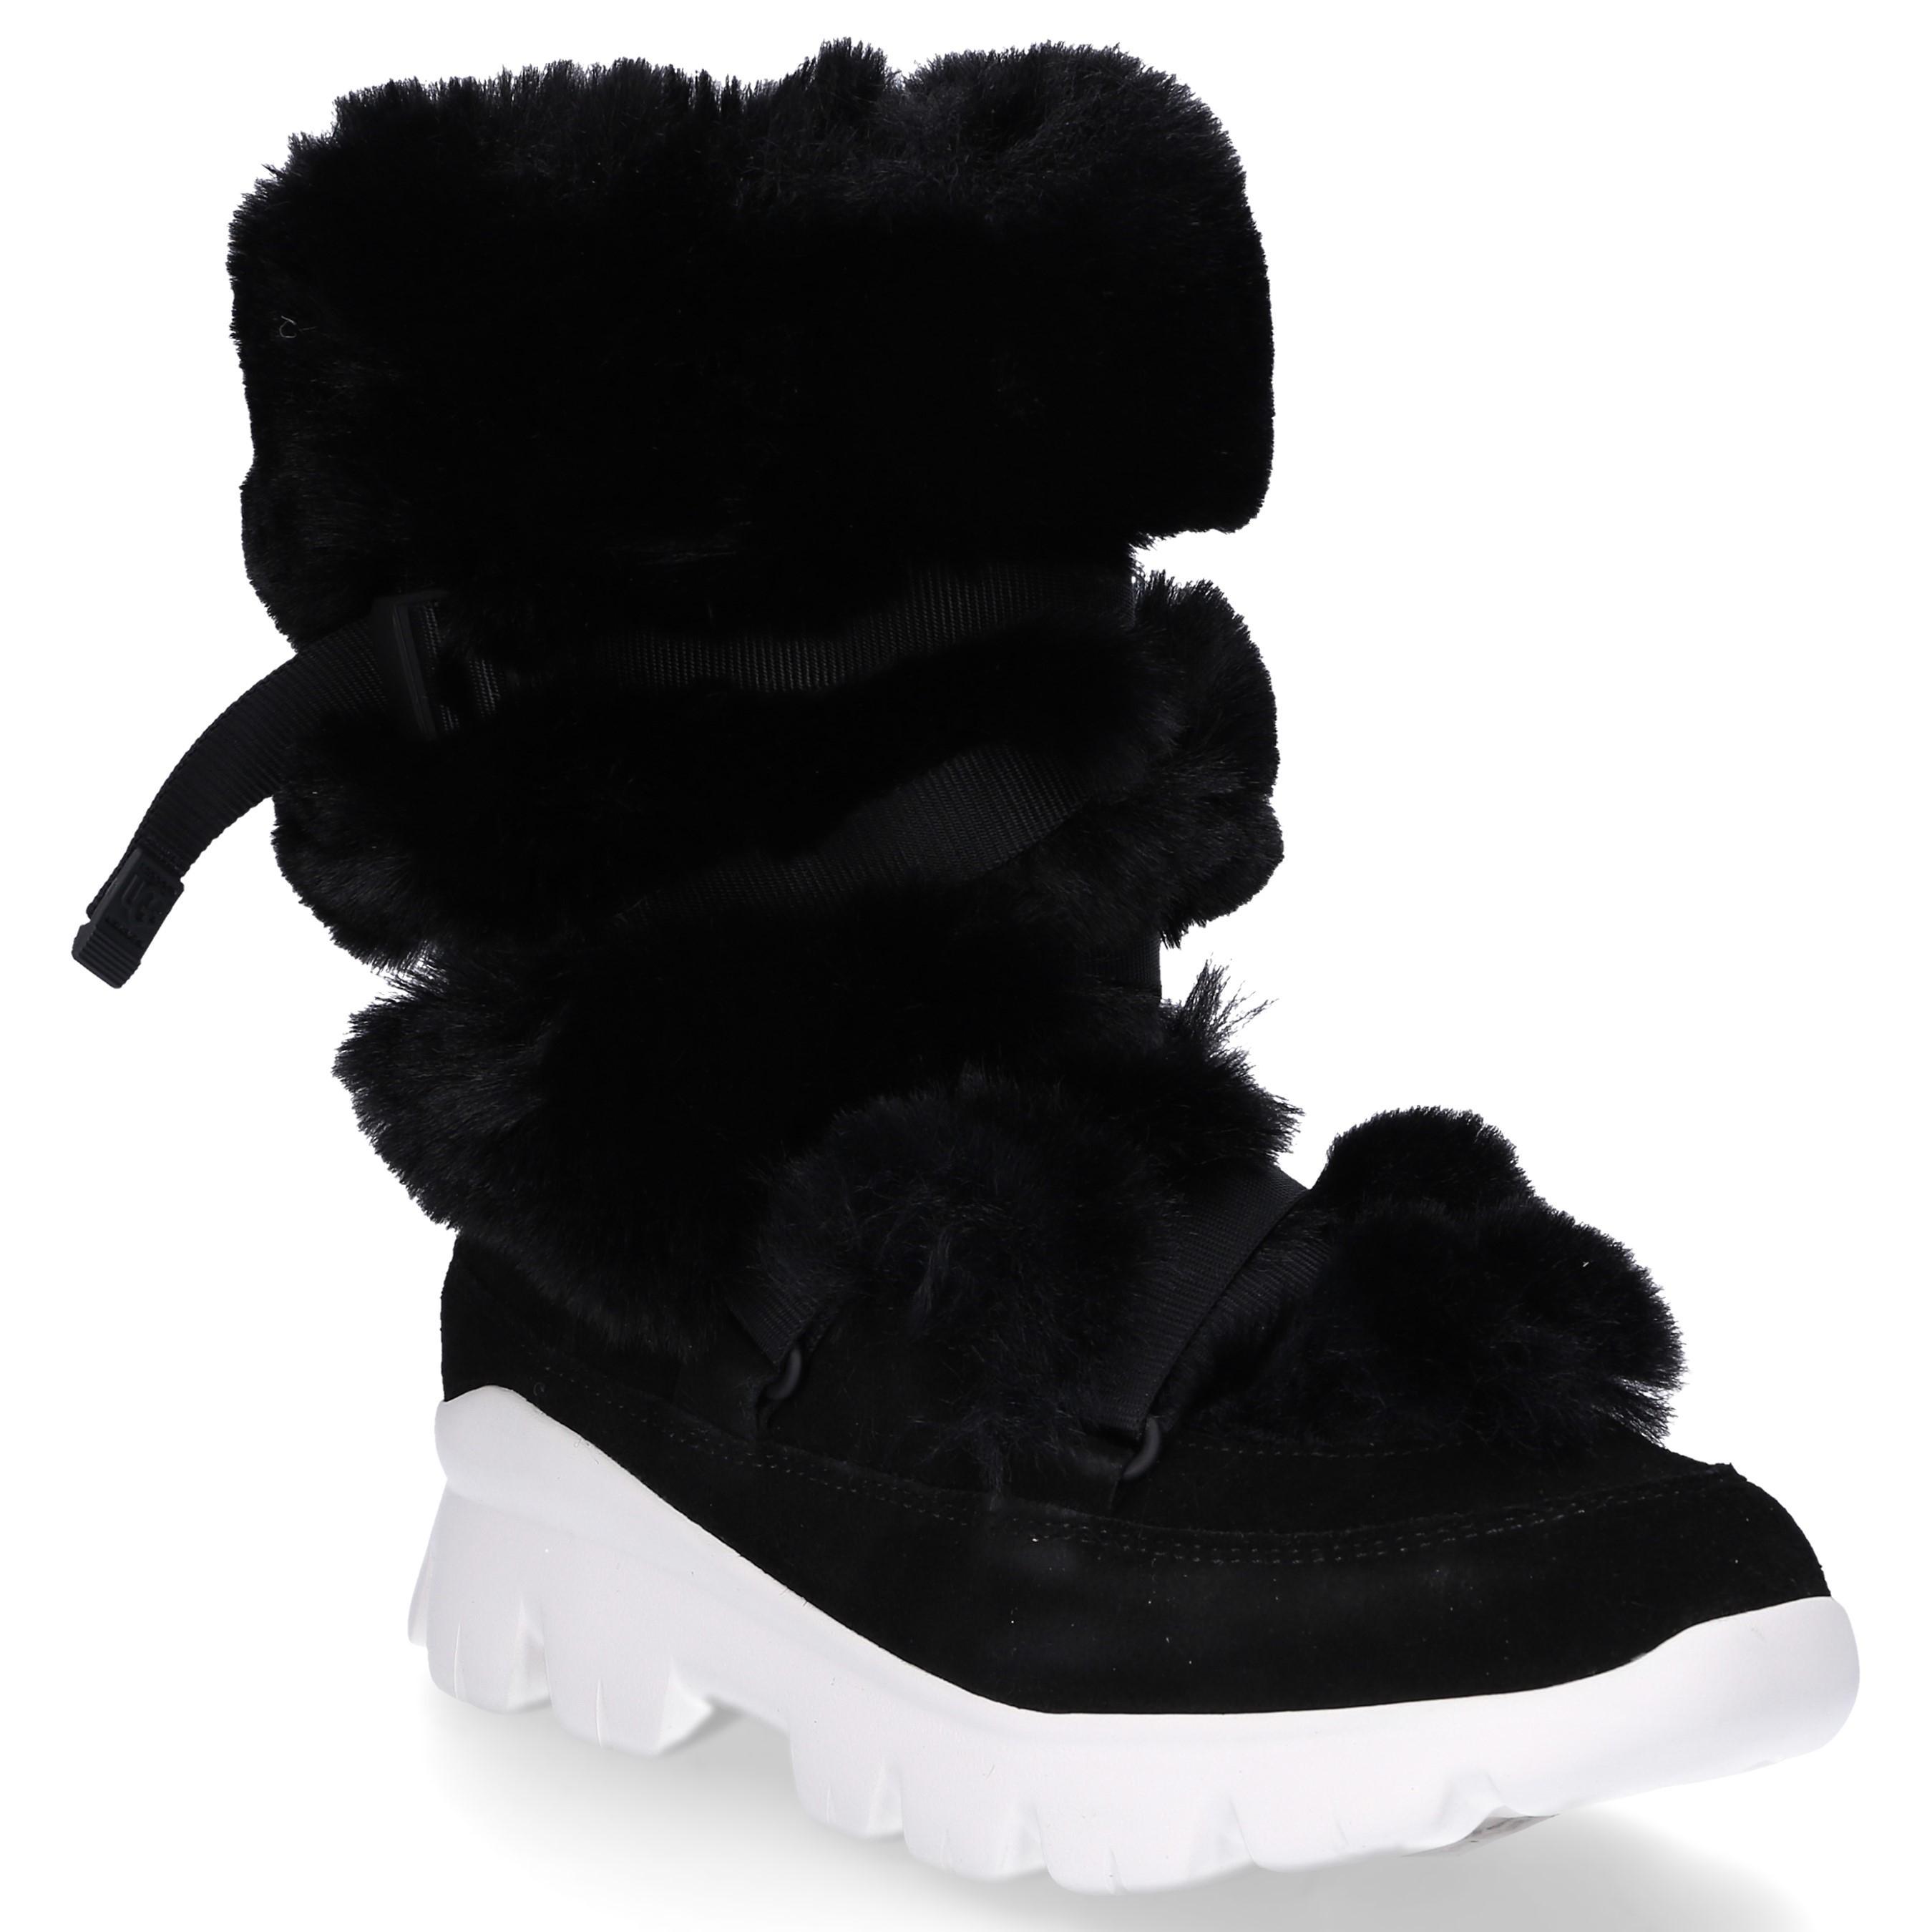 282a38cf089 Women's Ankle Boots Misty Boot Rabbit Fur Suede Decorative Lacing Fur Upper  Black